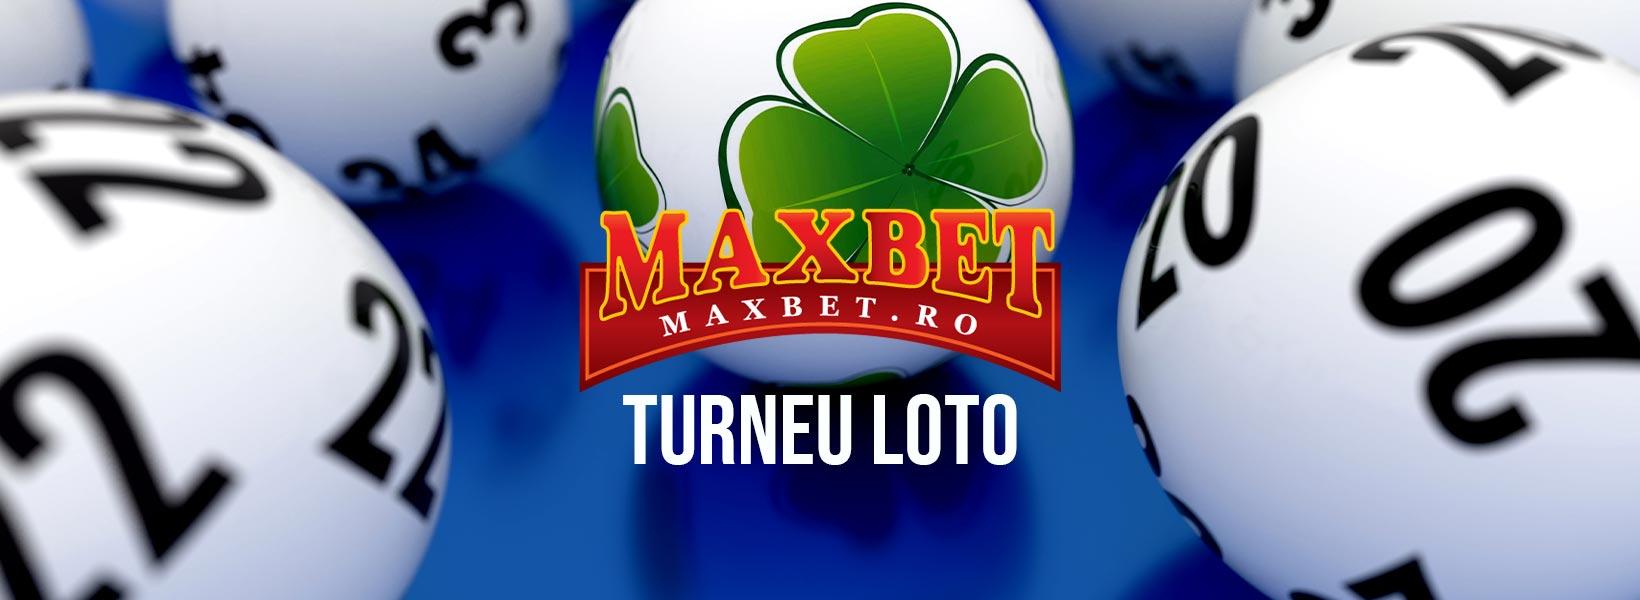 turneu maxbet loto